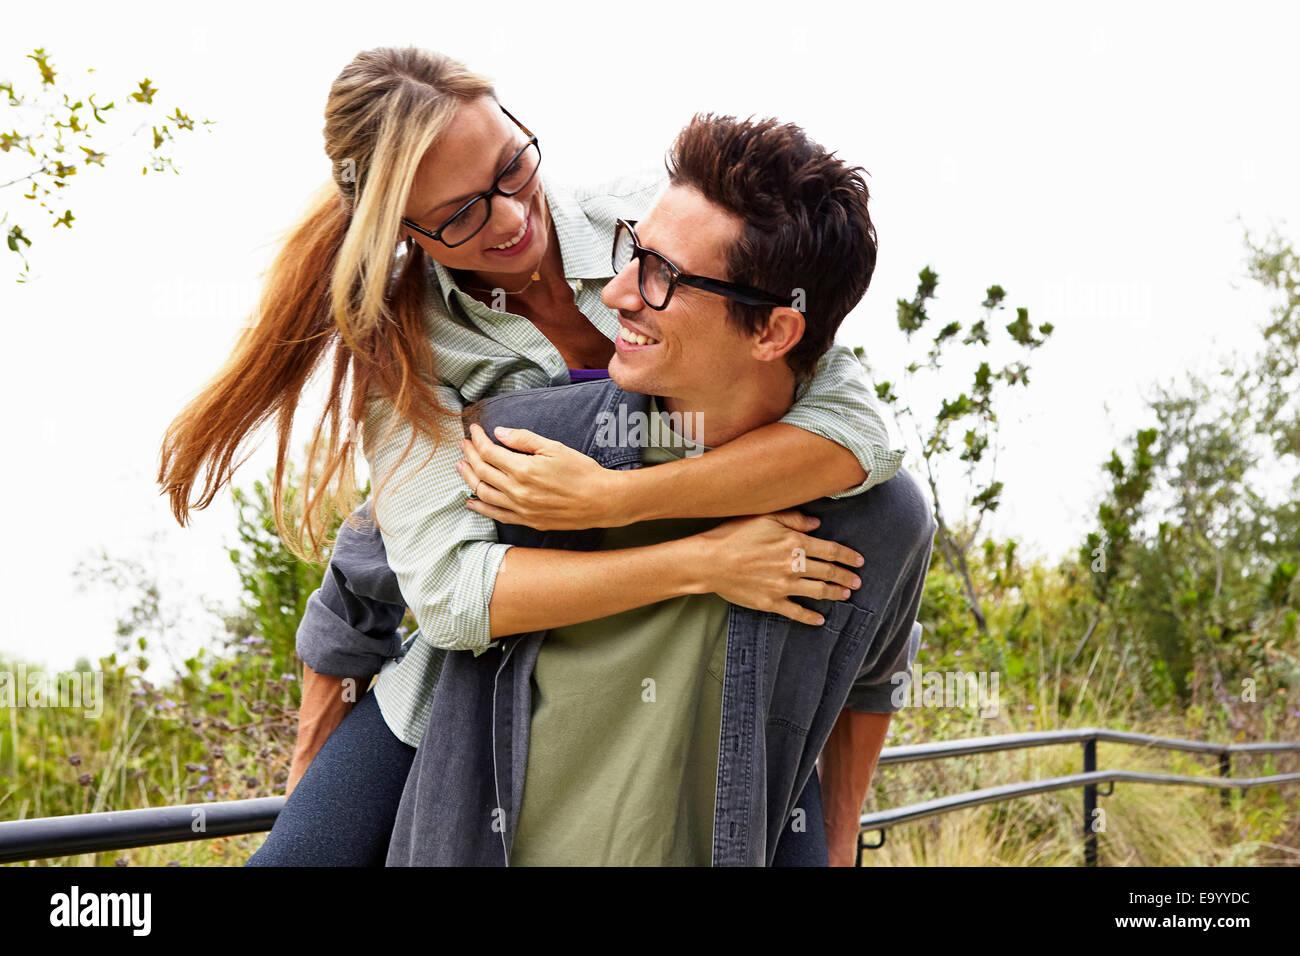 dating piggyback rides online nerd dating